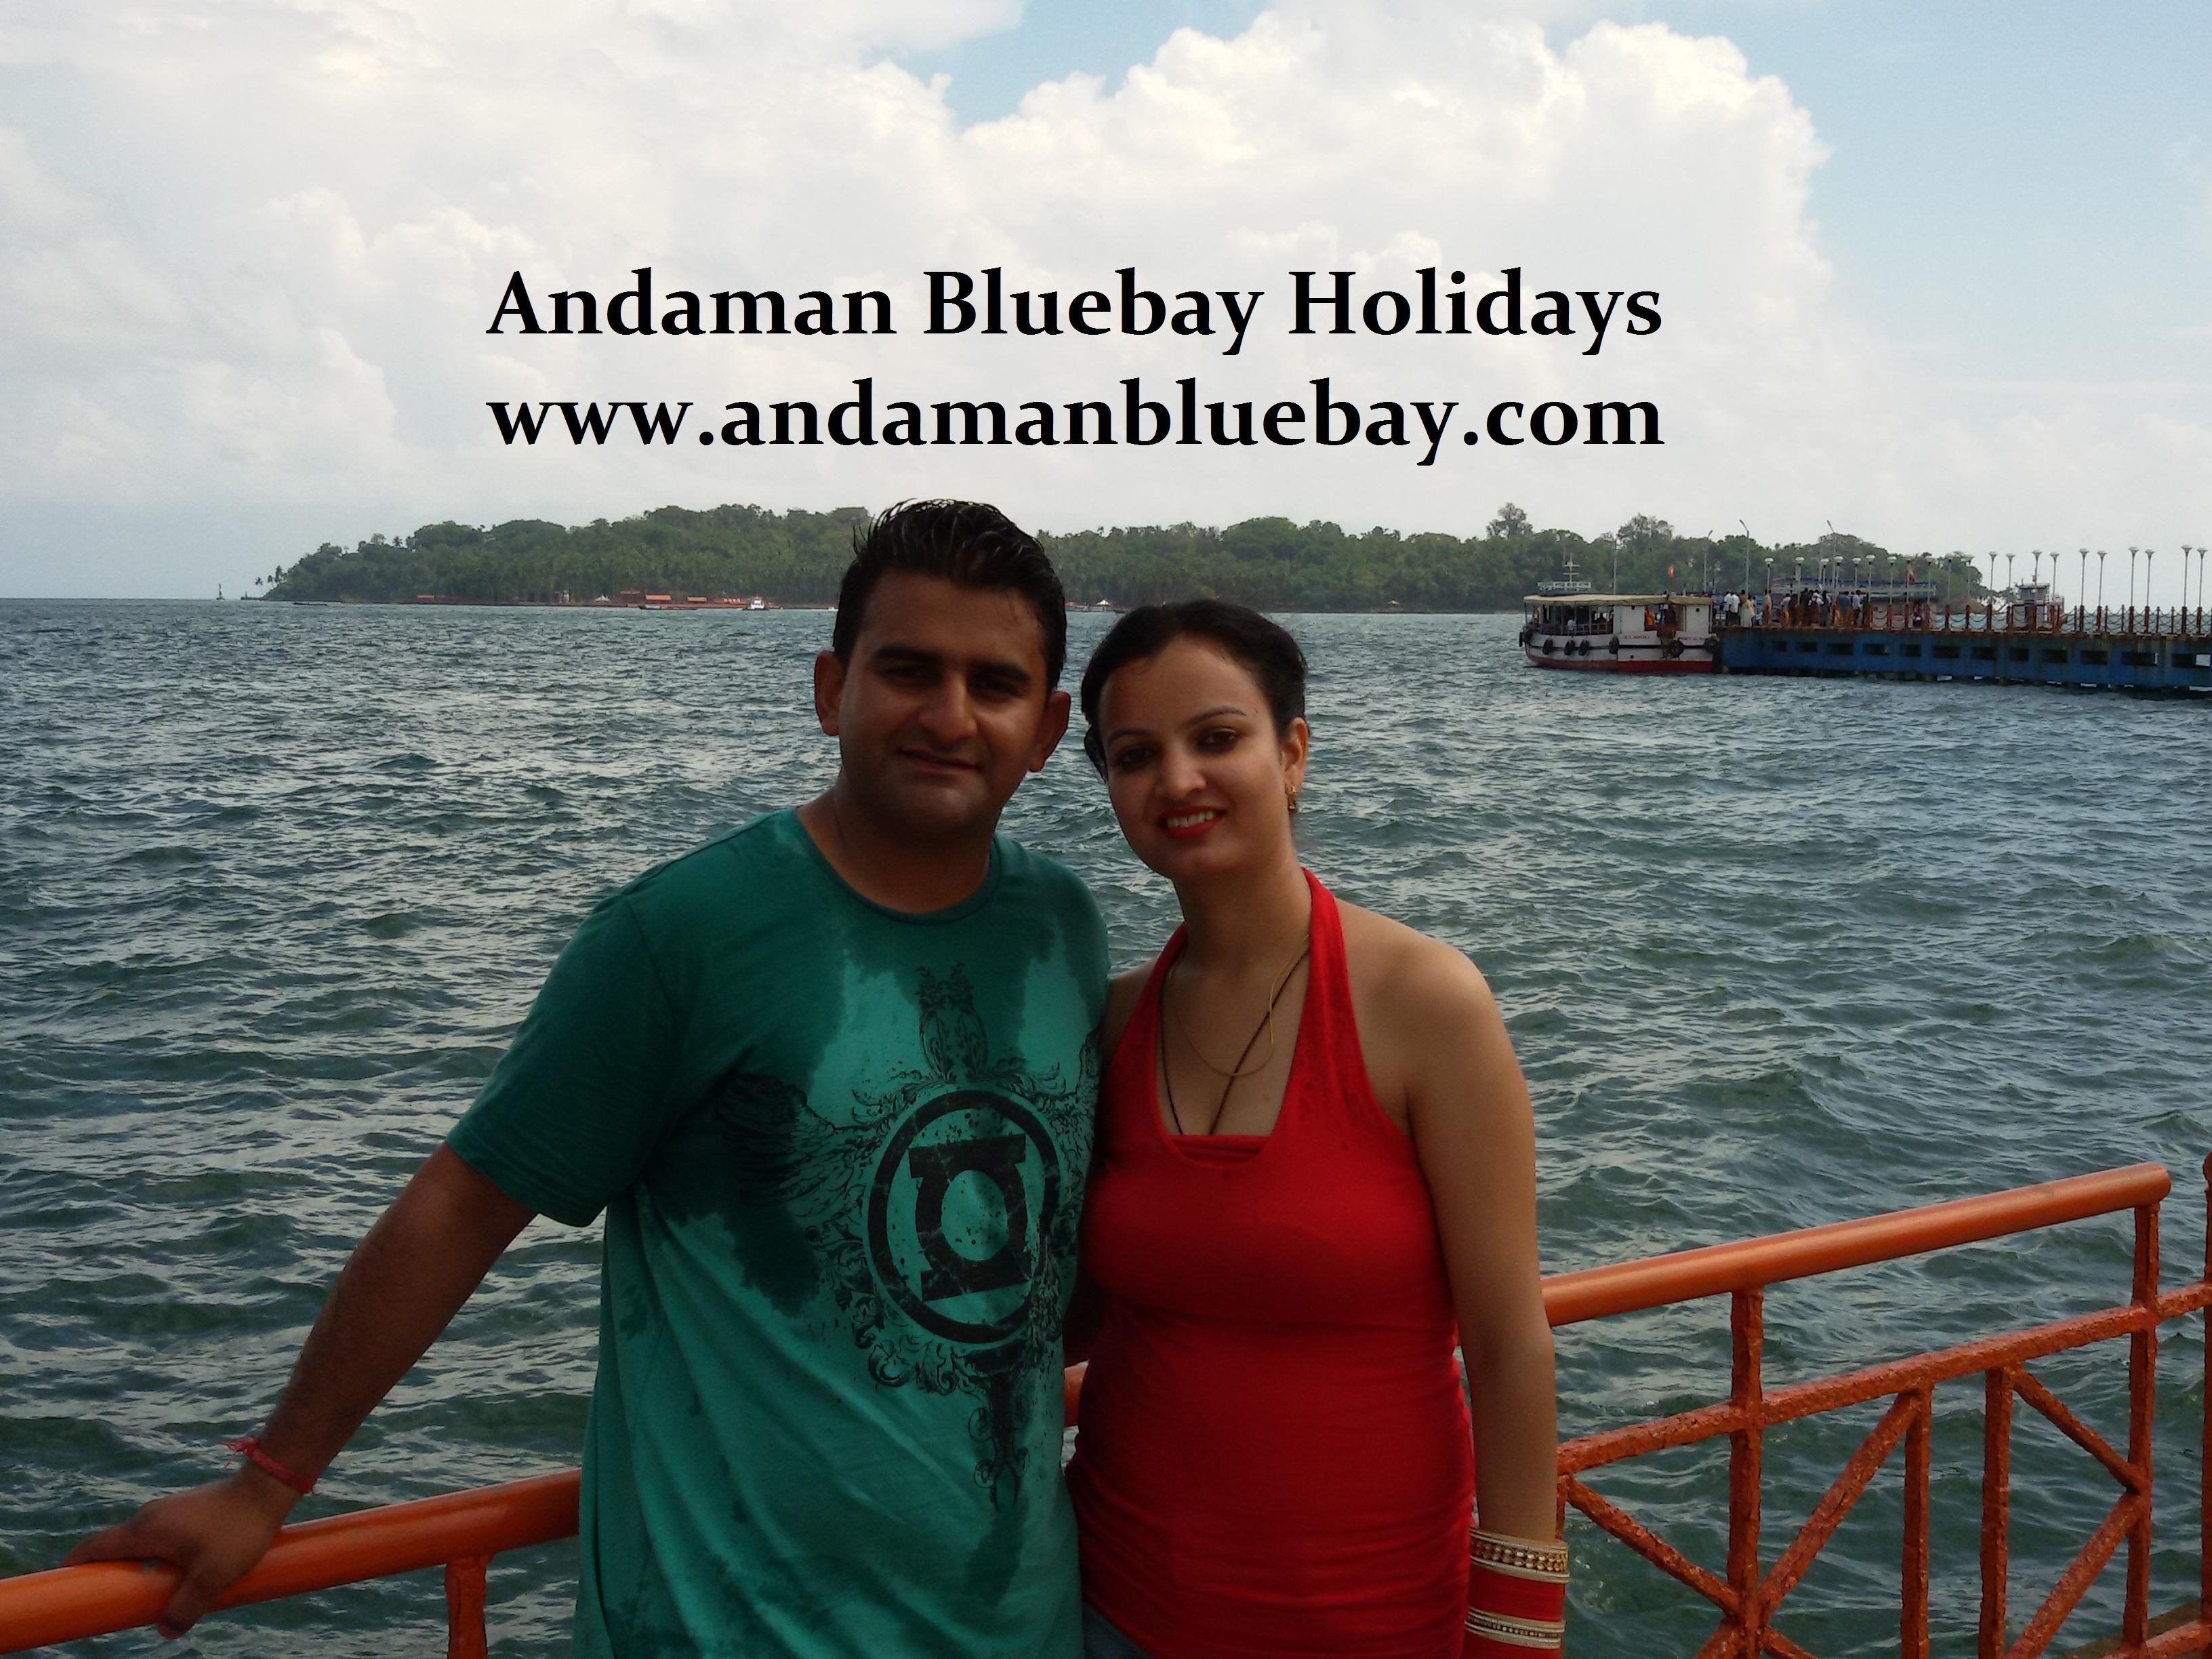 Andaman_Bluebay_Holidays